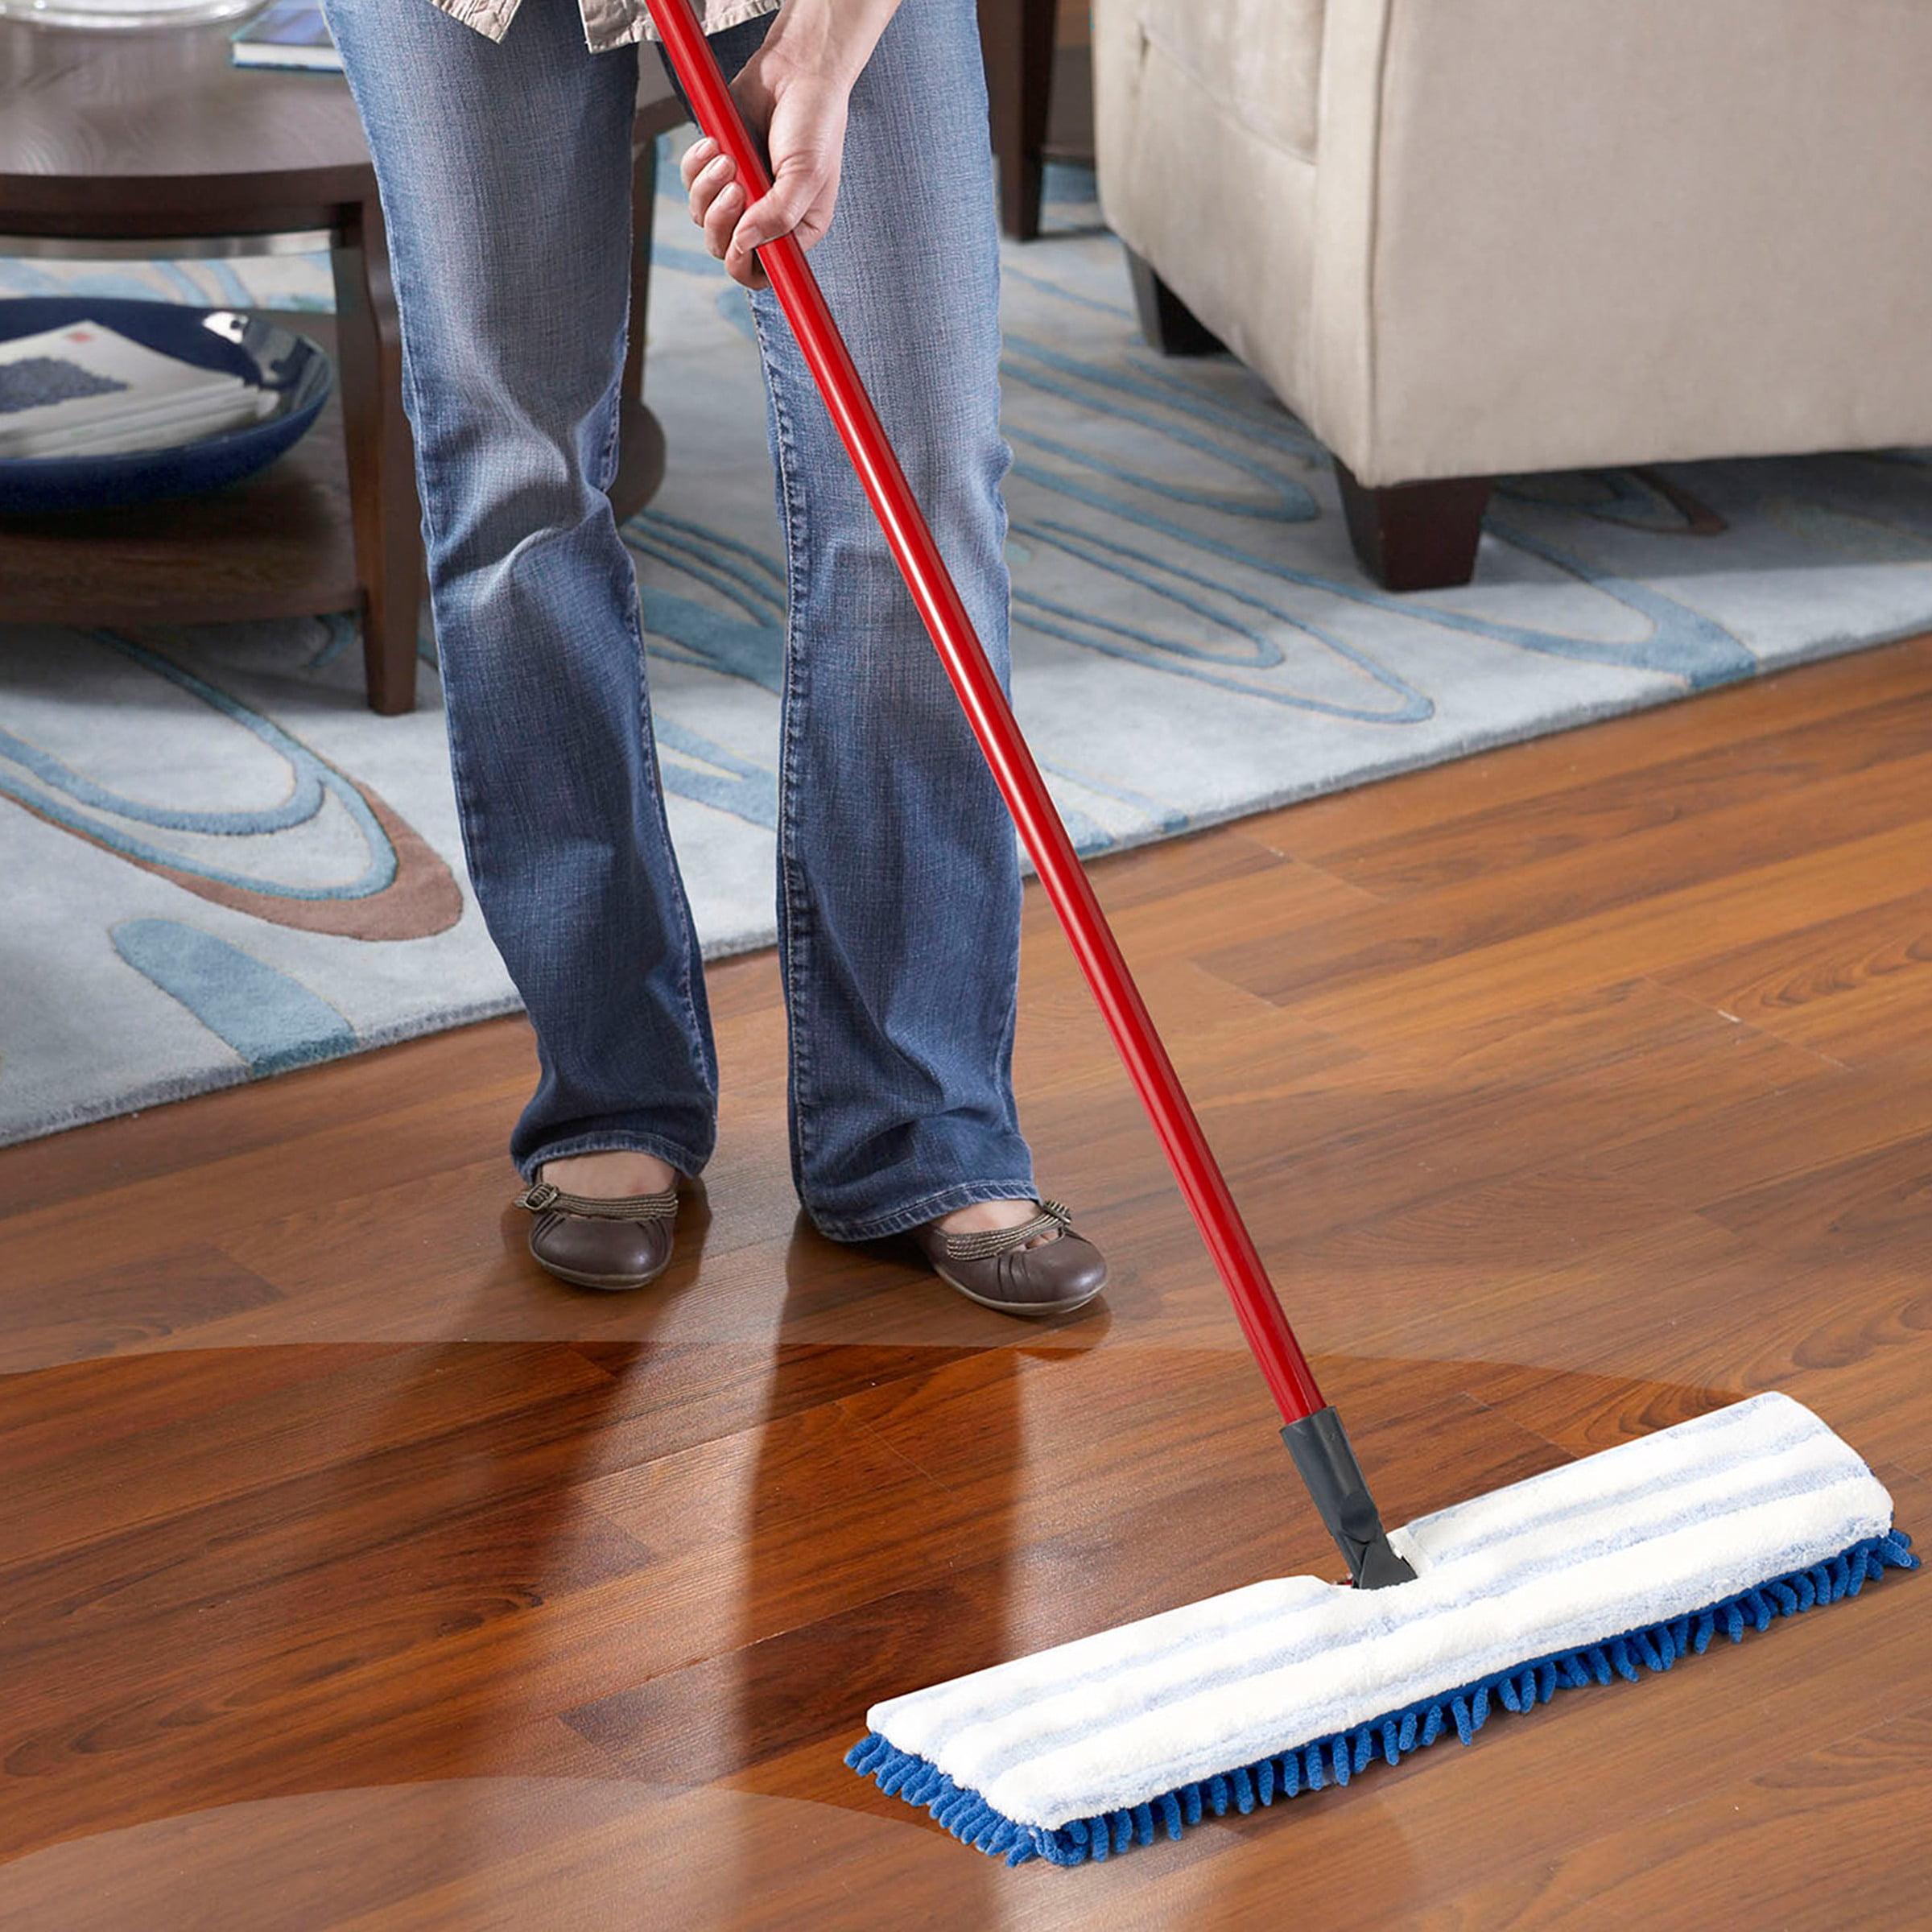 Dust mop for wood floors - Dust Mop For Wood Floors 23